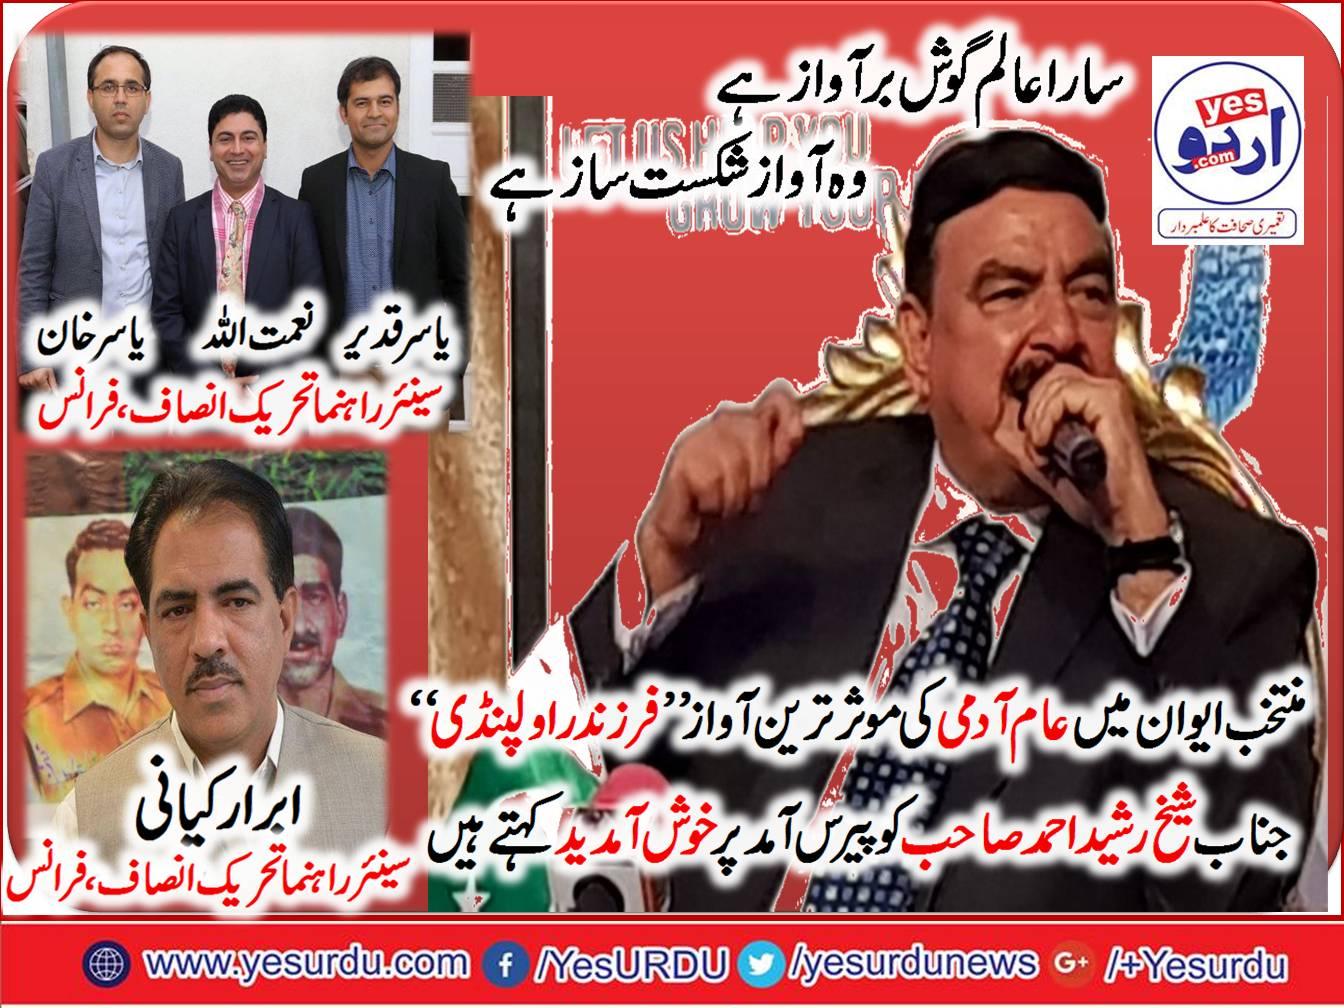 Sheikh Rasheed,Ahmed, visit, to, Paris, tomorrow, senior, leaders, PTI, Ibrar kayani, yasir qadeer, naimat ullah, welcom, him,